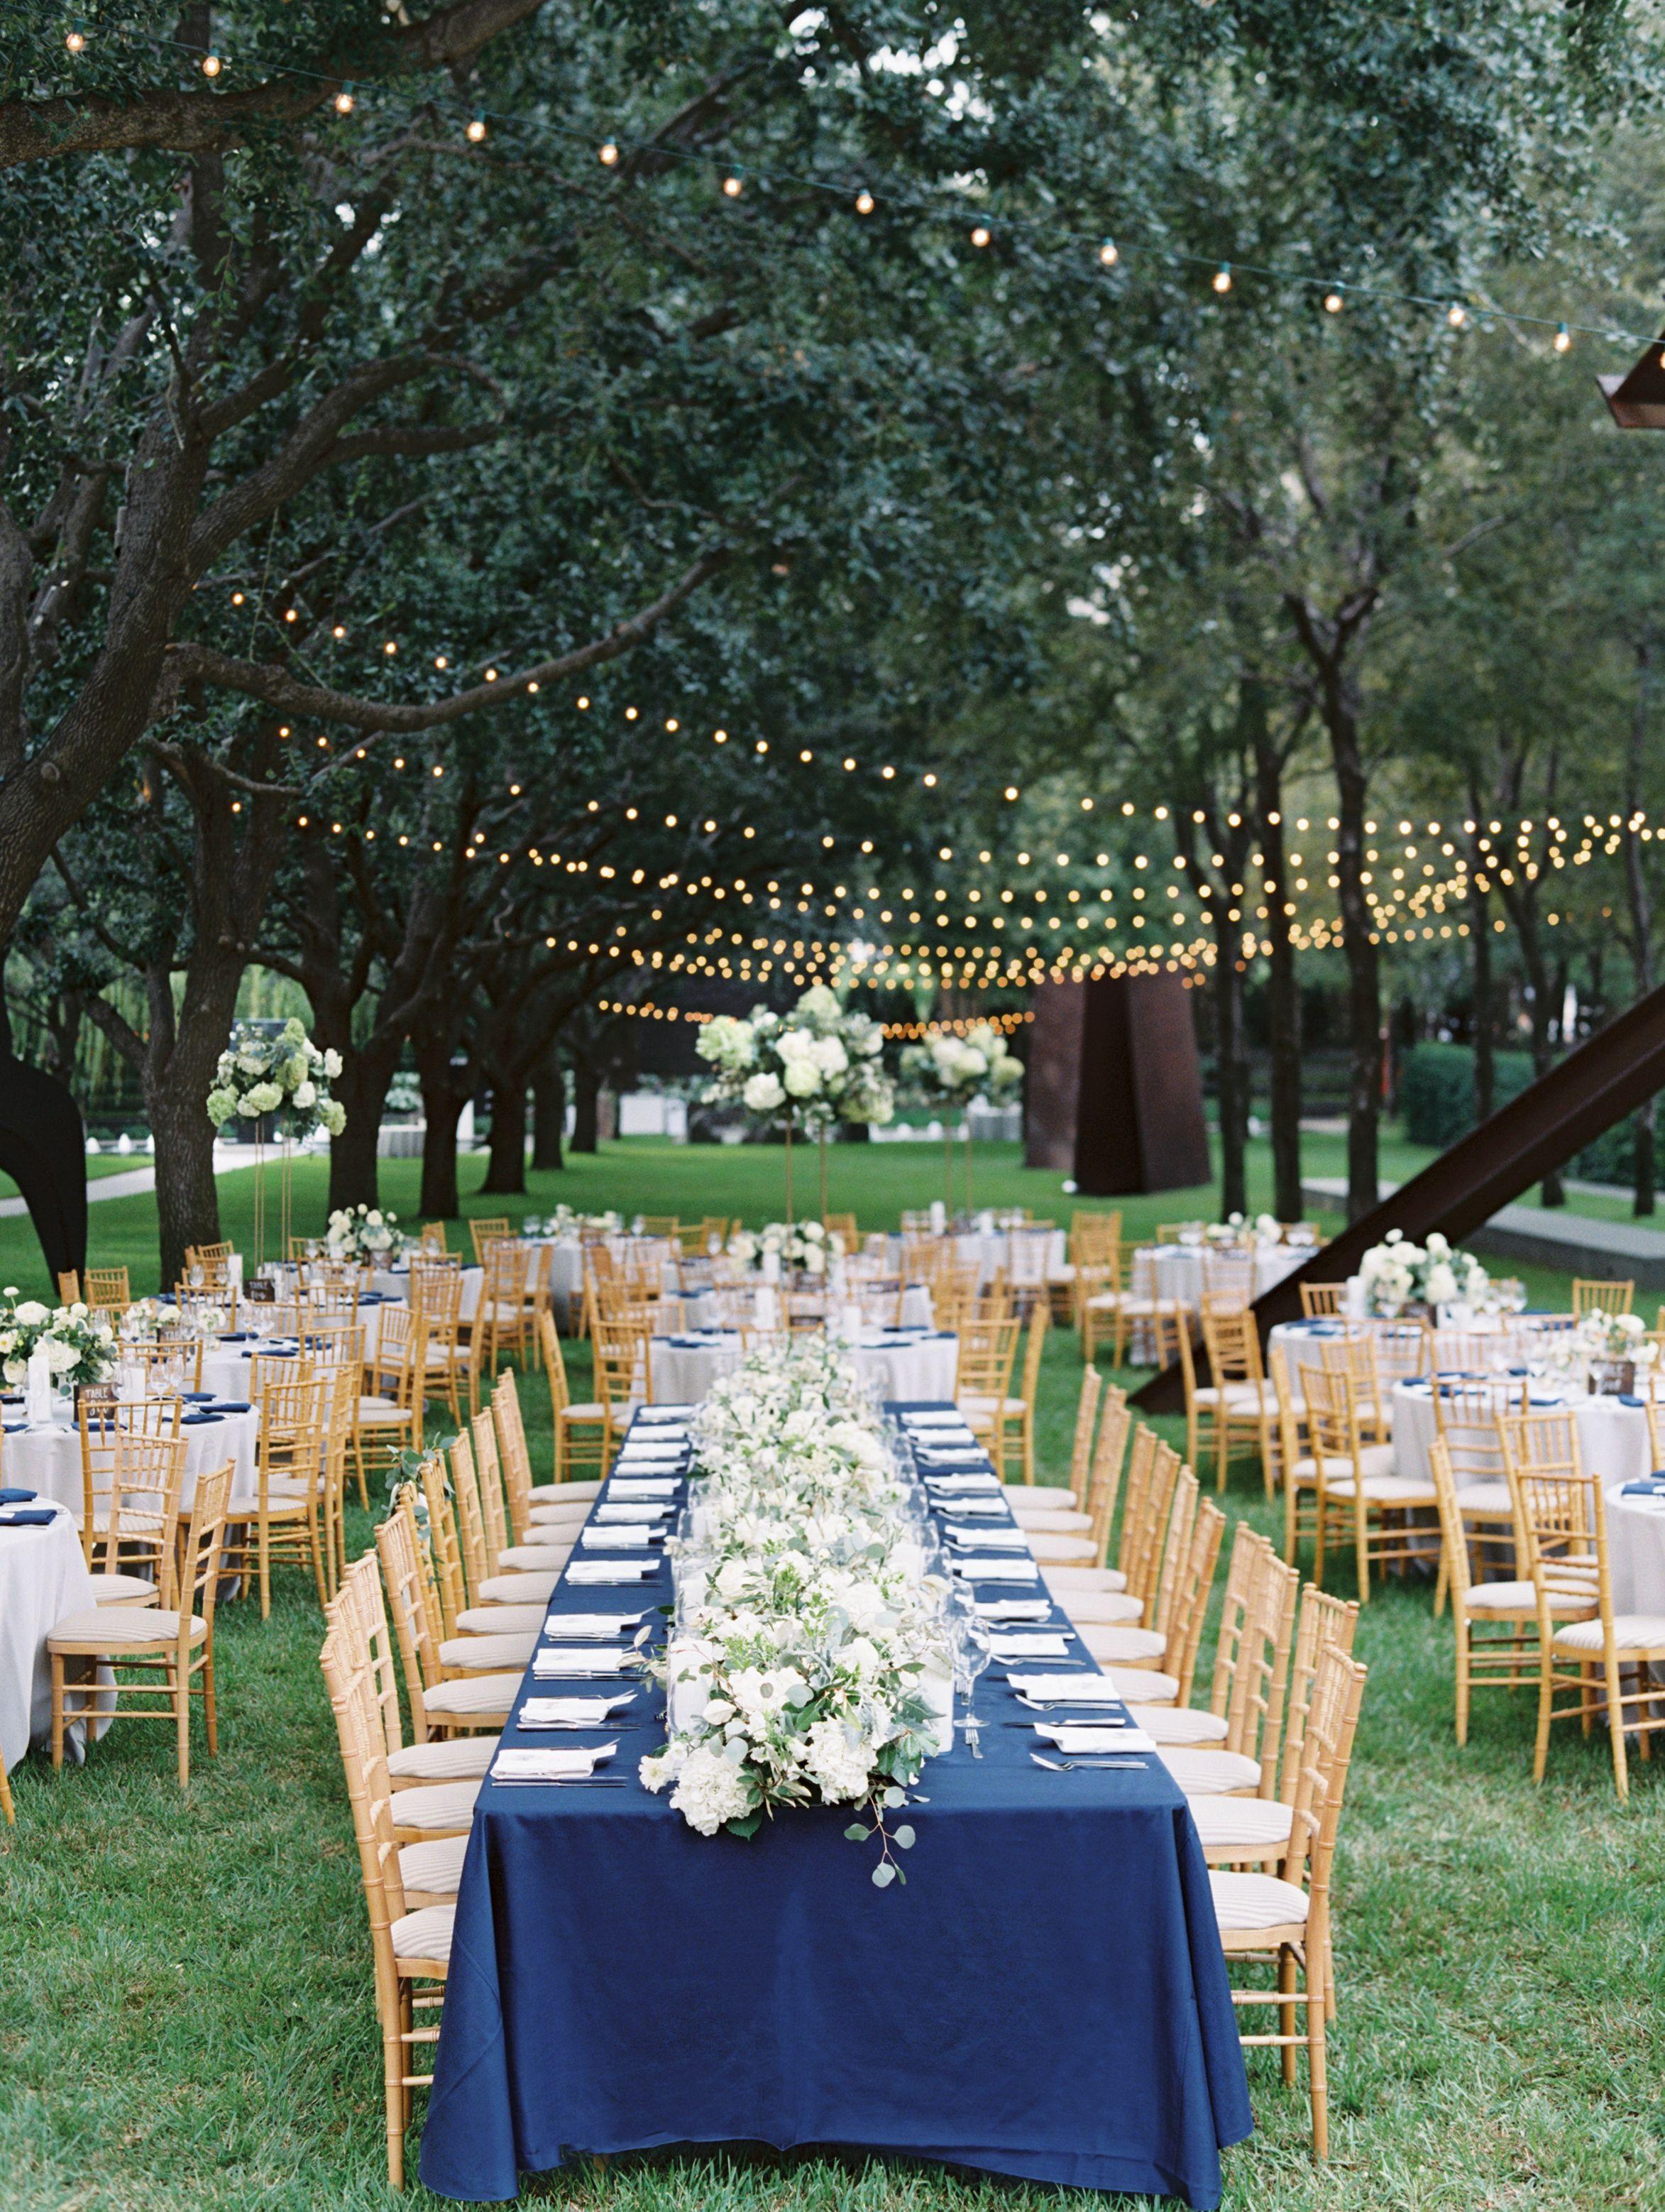 Nasher Sculpture Center In Texas Was The Backdrop For A Modern Garden Wedding Classic Blue Wedding Blue Wedding Decorations Navy Blue Wedding Decorations